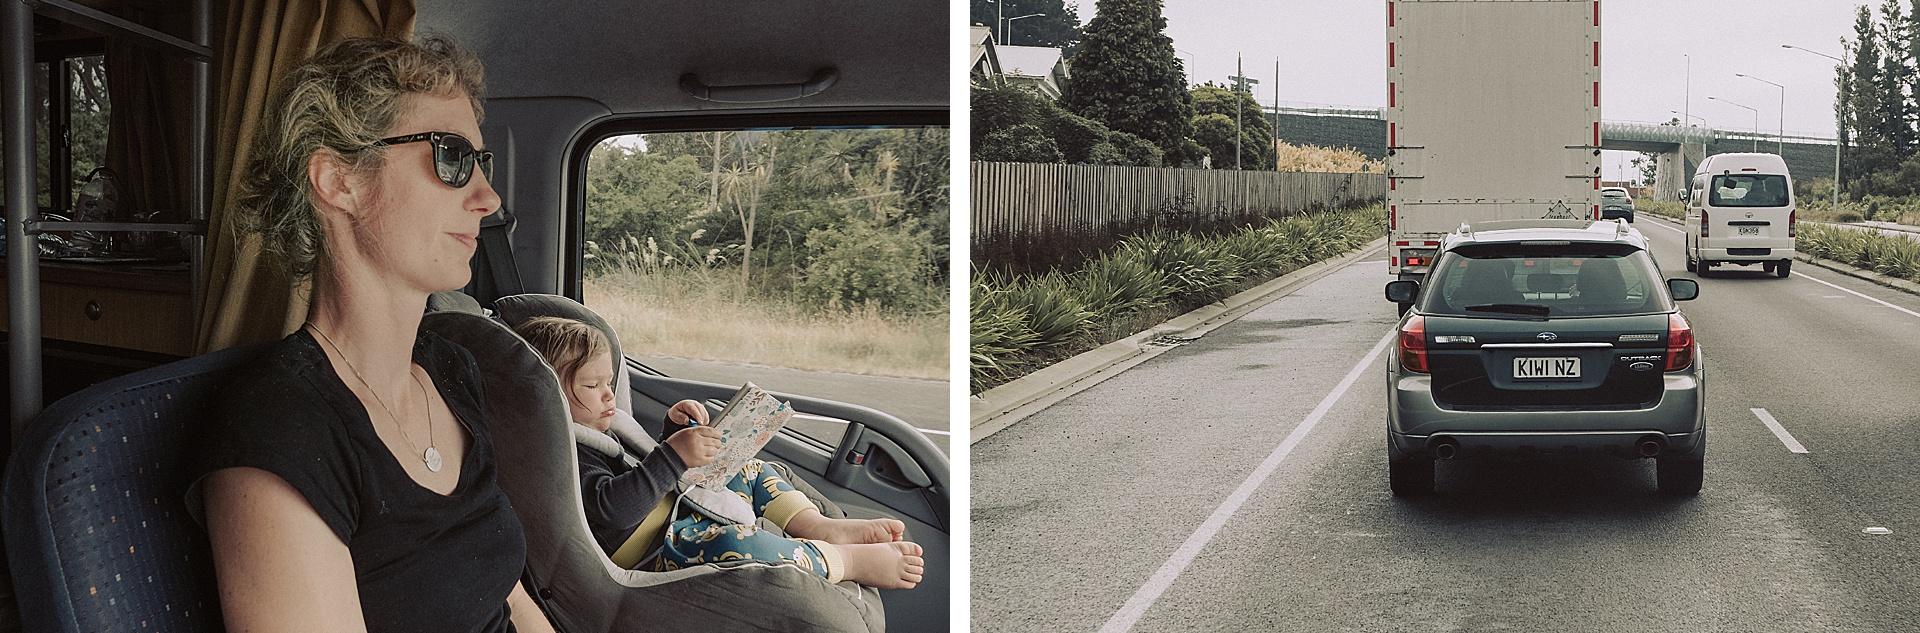 family-roadtrip-neuseeland-travelnewzealand-danielzube_0513.jpg